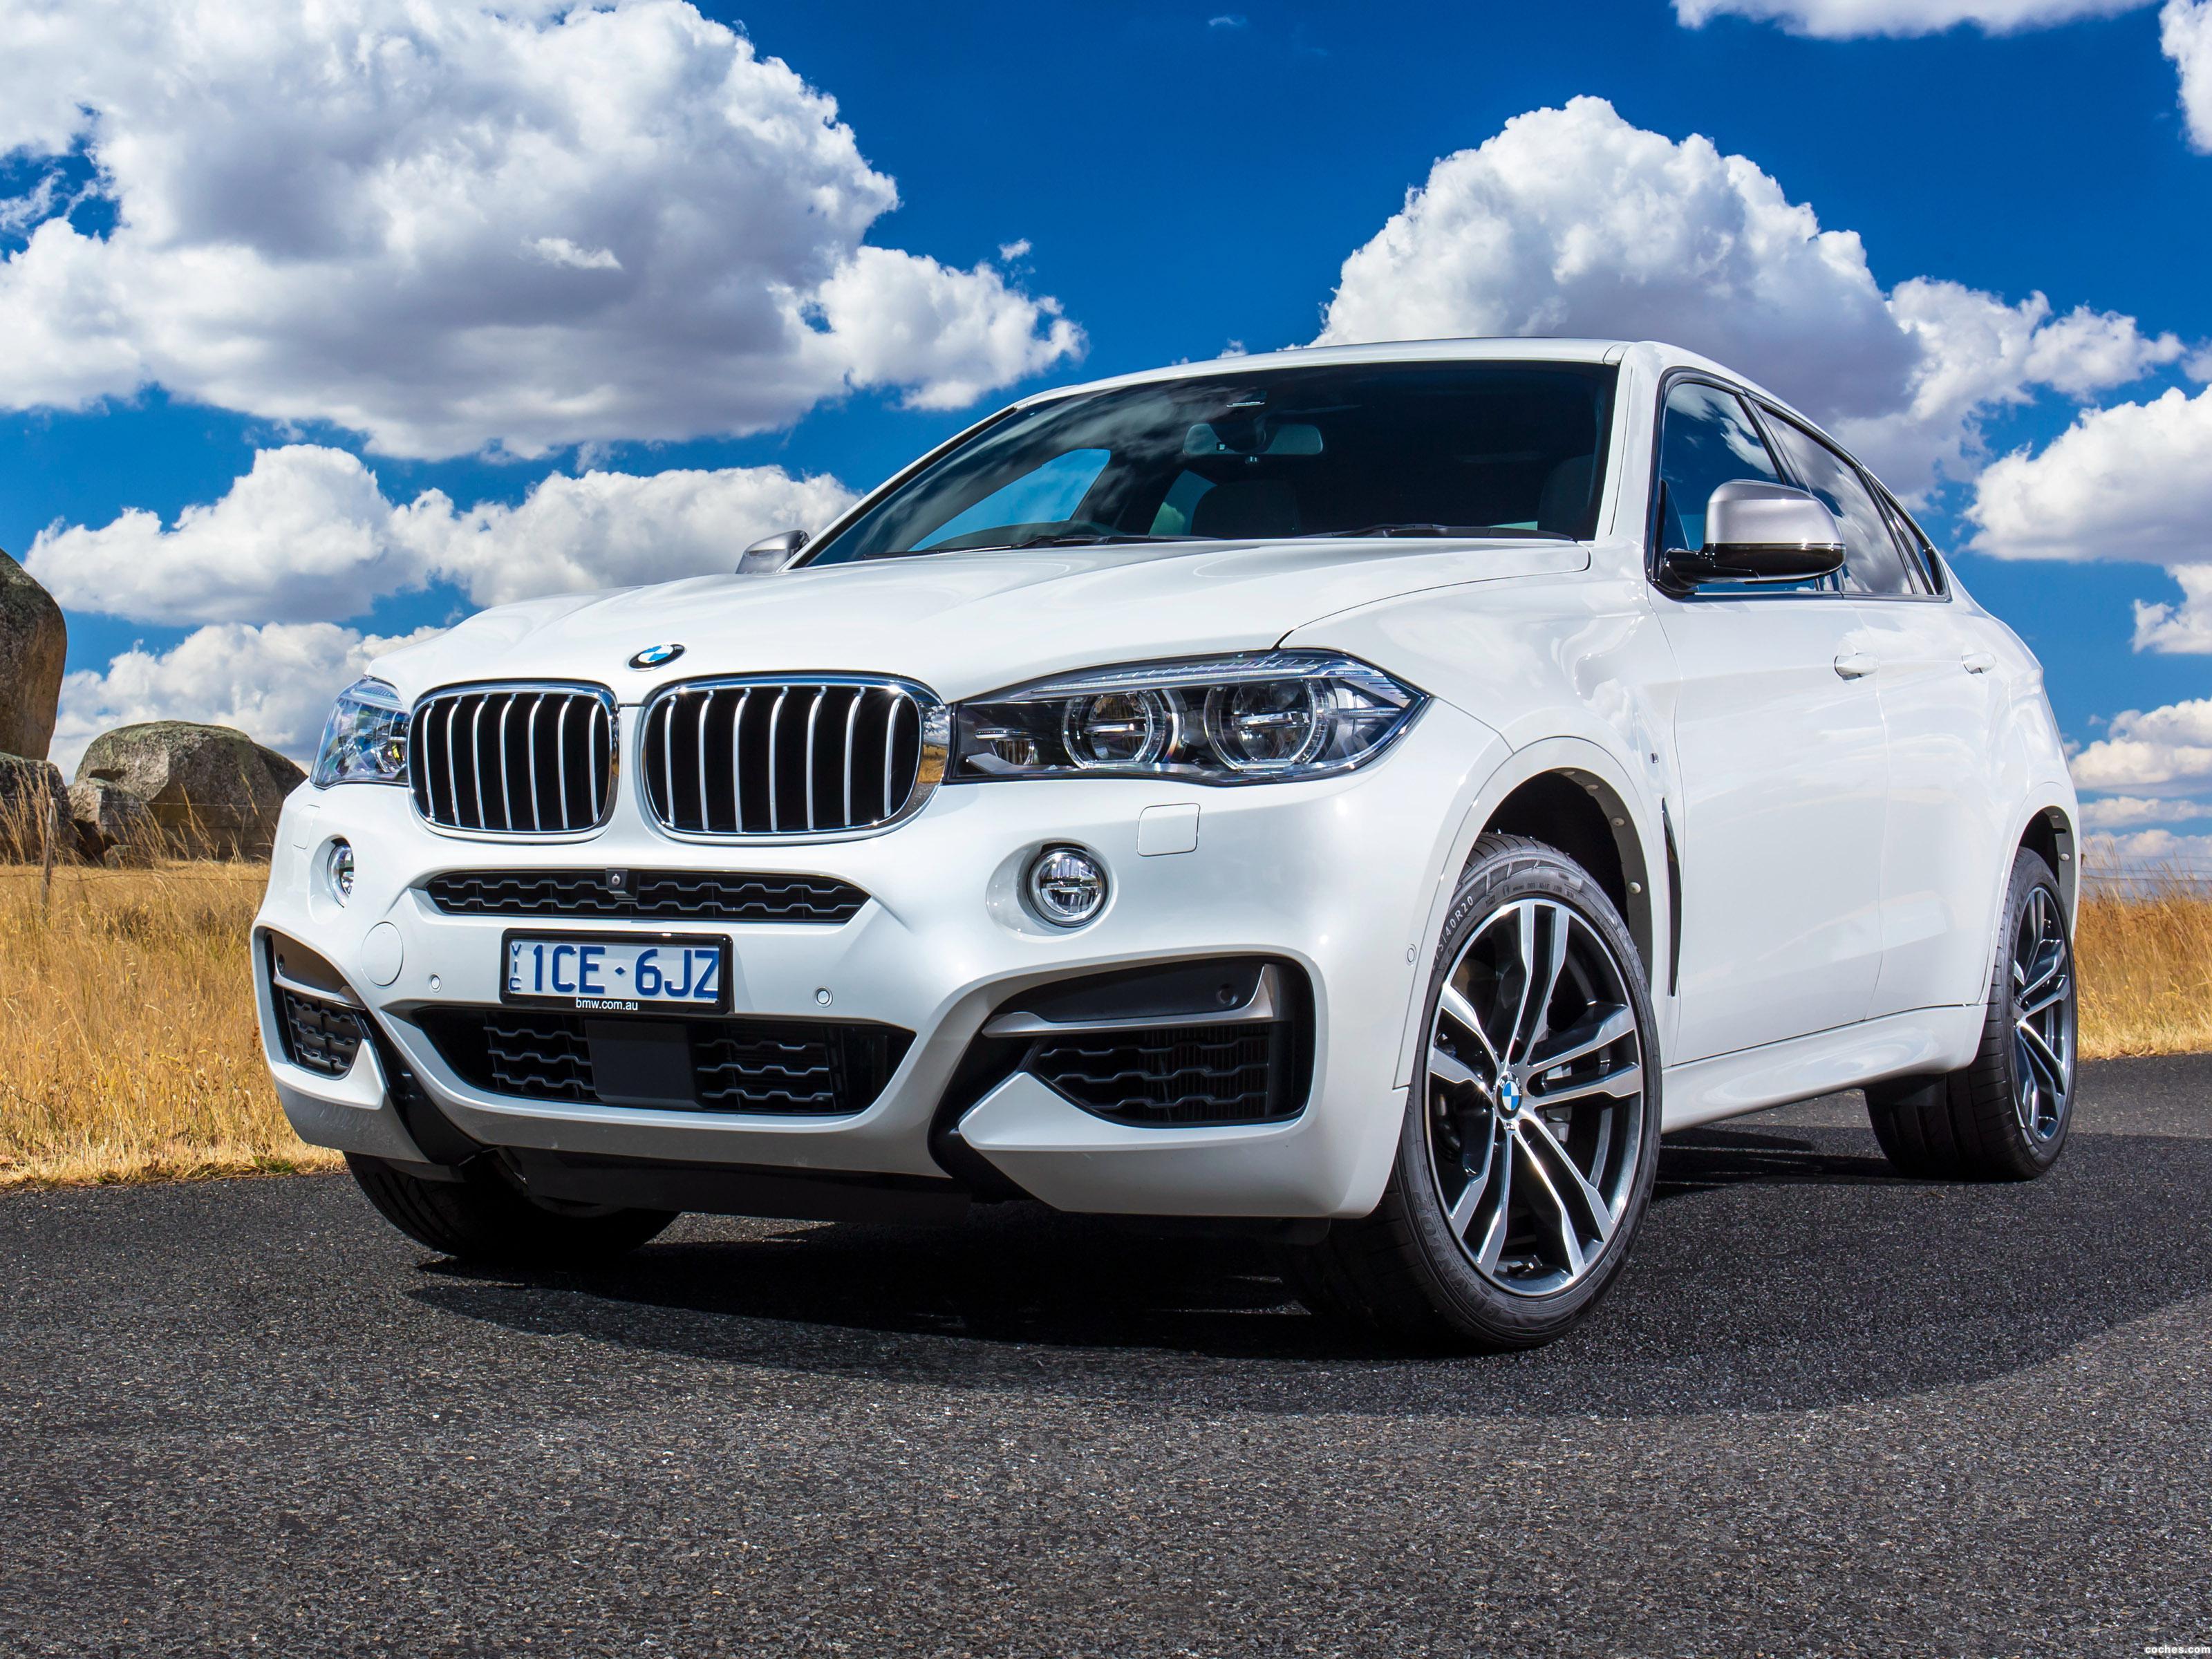 Foto 0 de BMW X6 M50d F16 Australia 2015